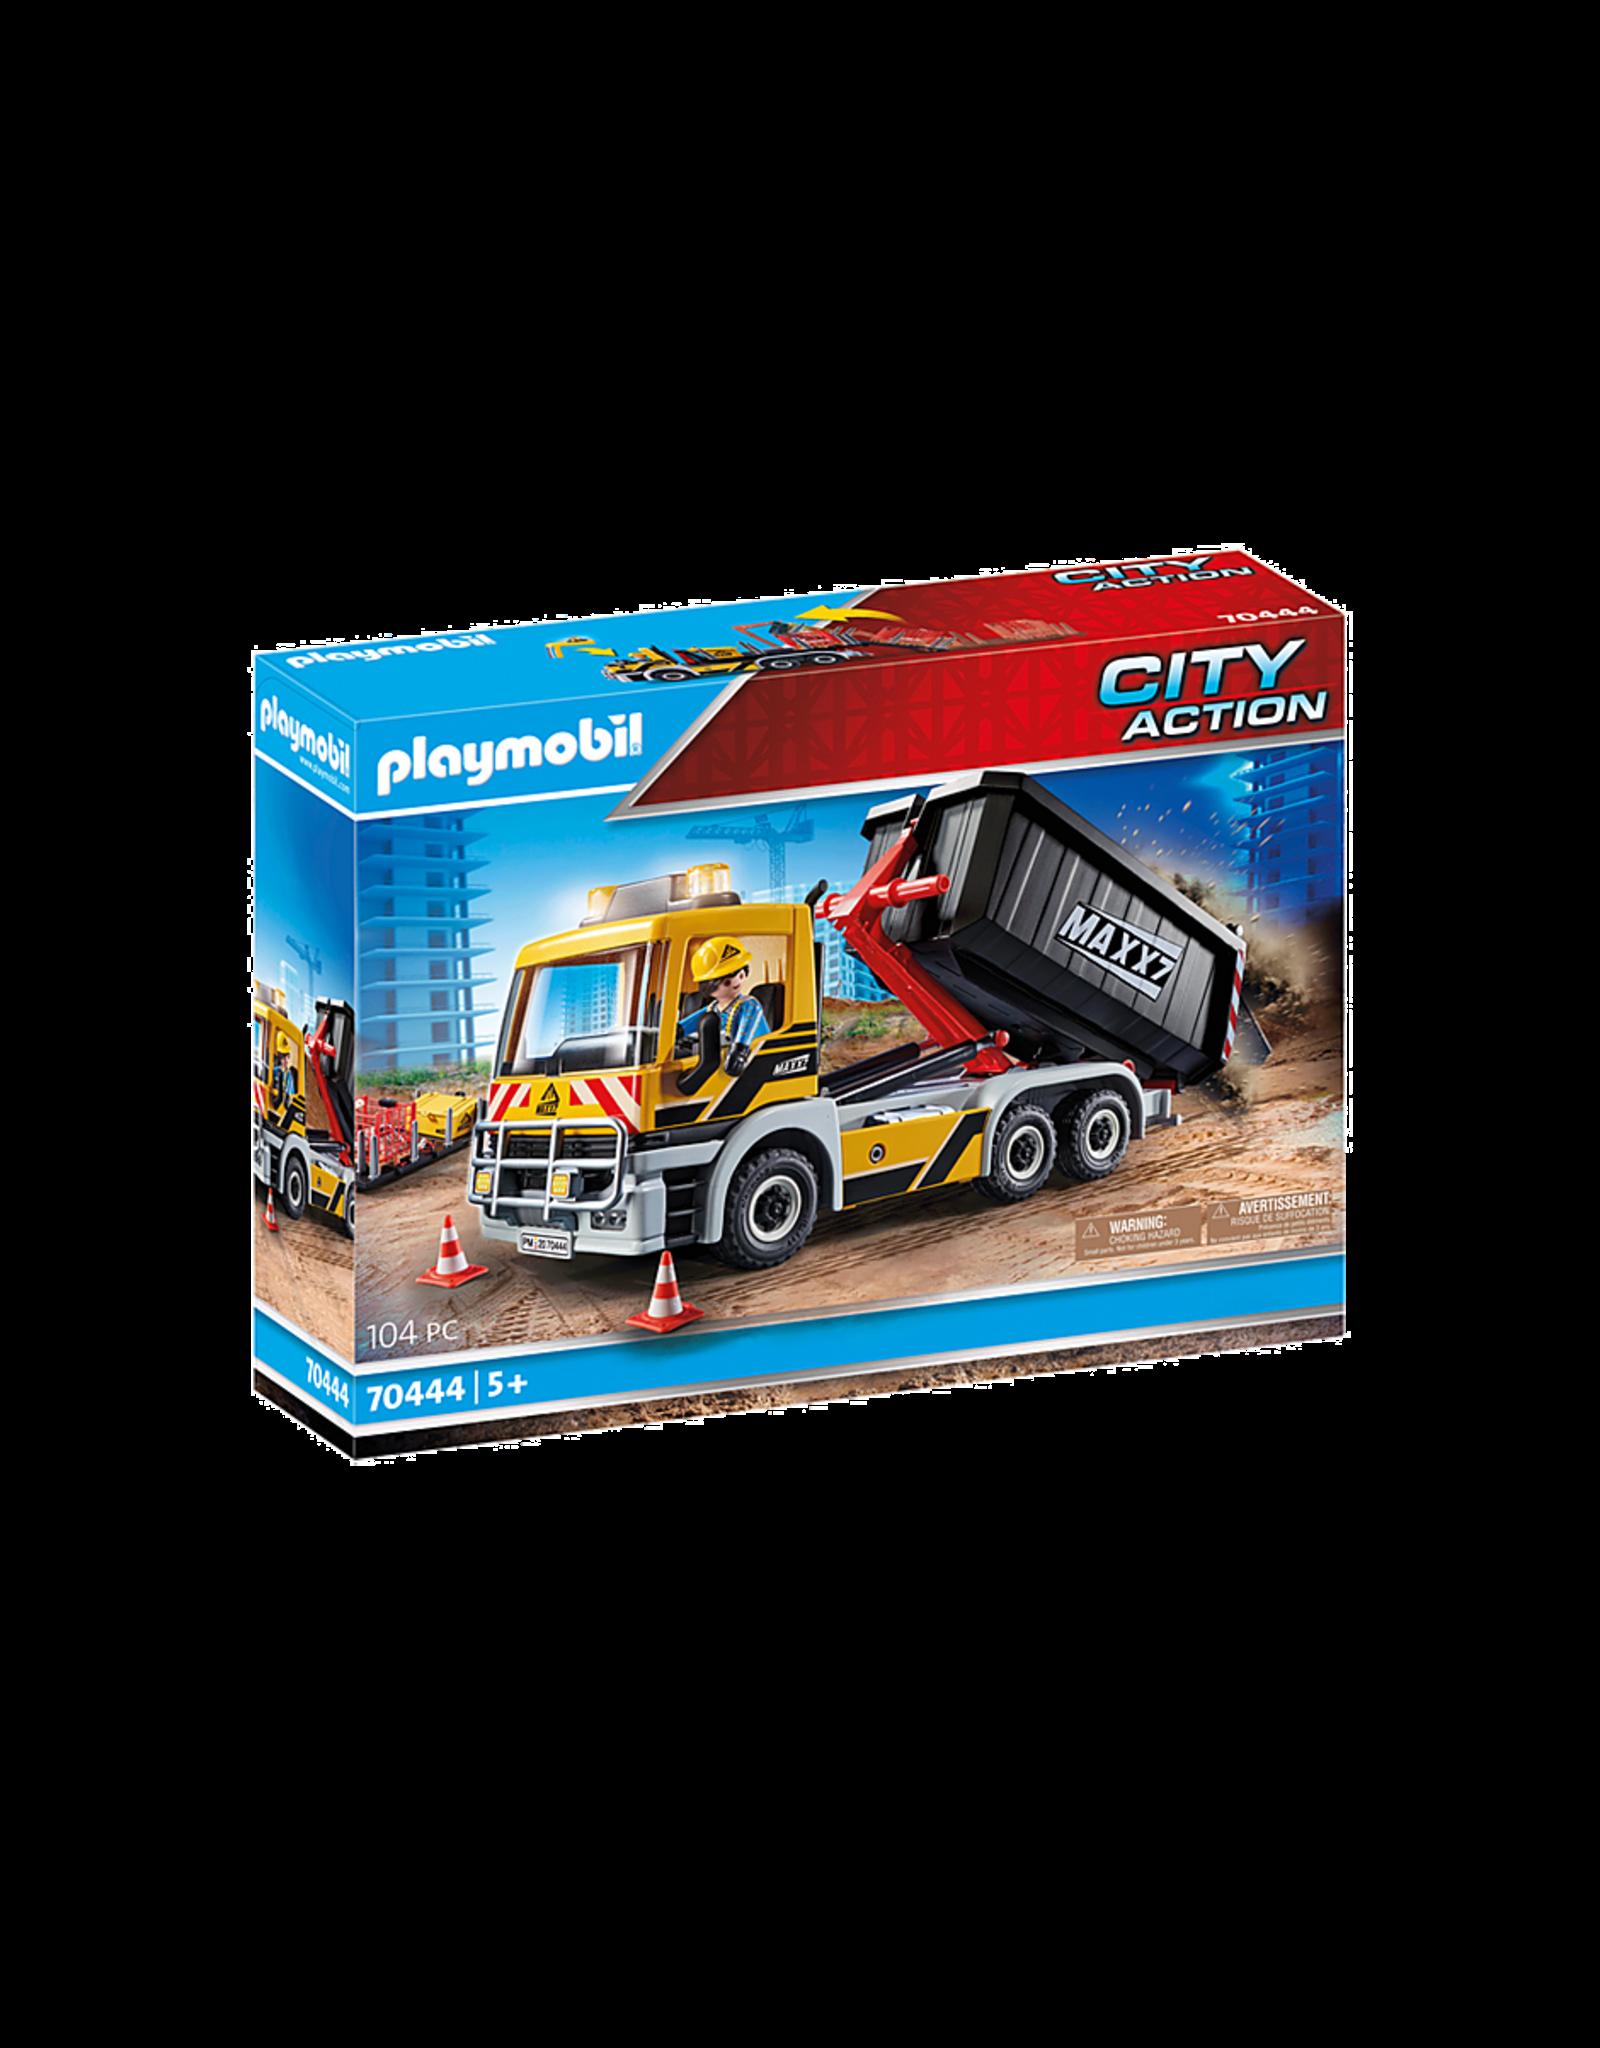 Playmobil Interchangeable Truck